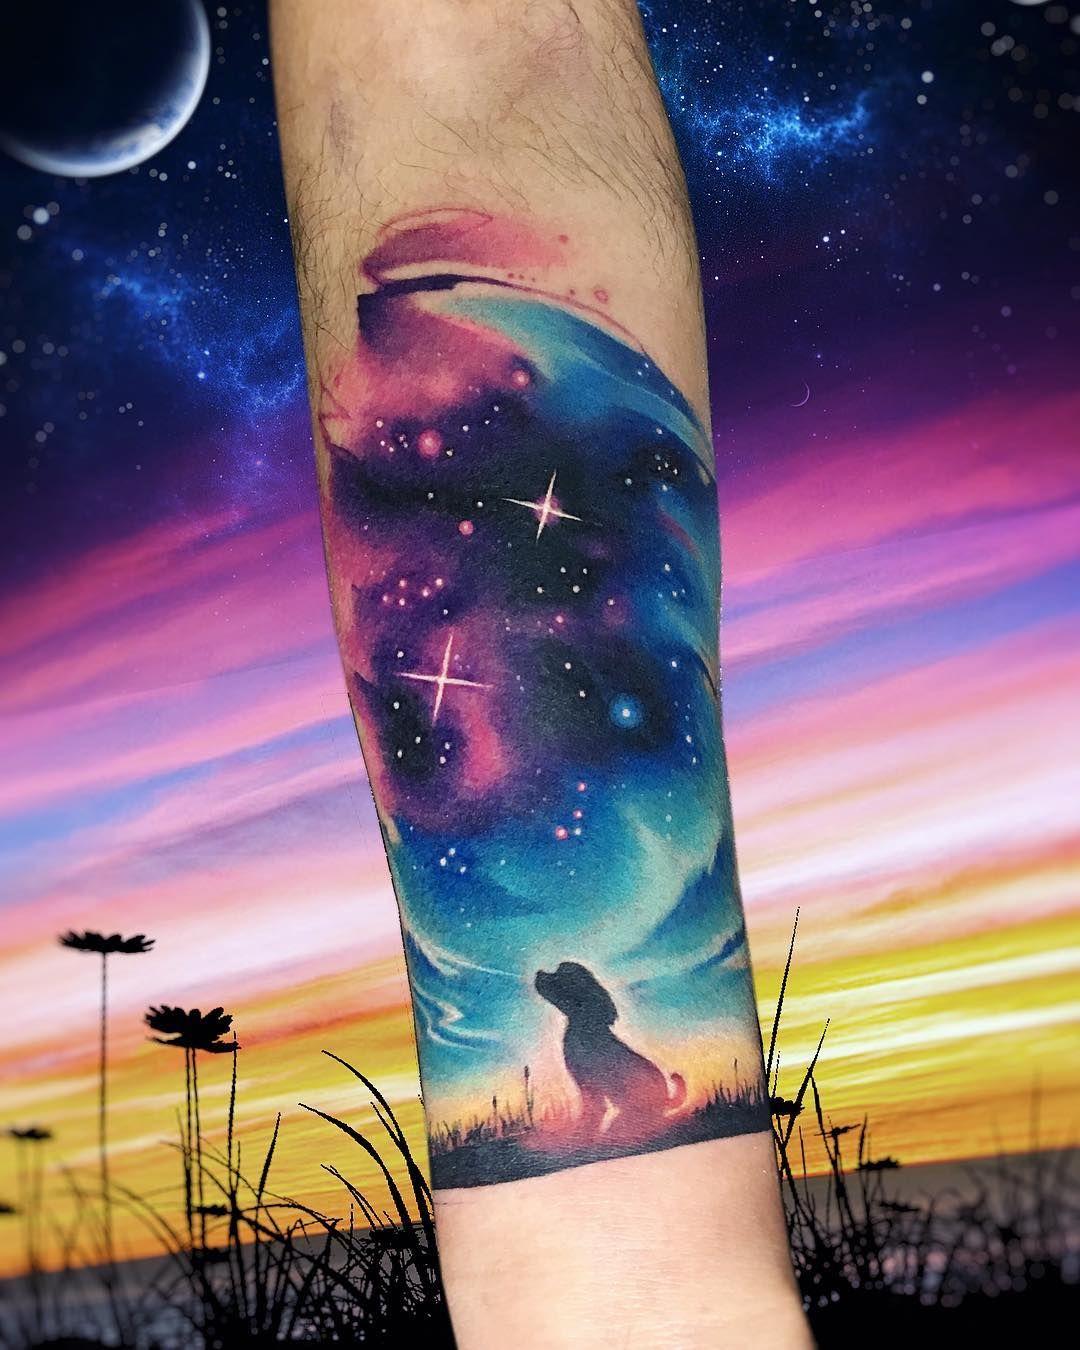 Tatuajes Del Espacio so cuteeeee   right sleeve   pinterest   tatuajes, tatuaje universo